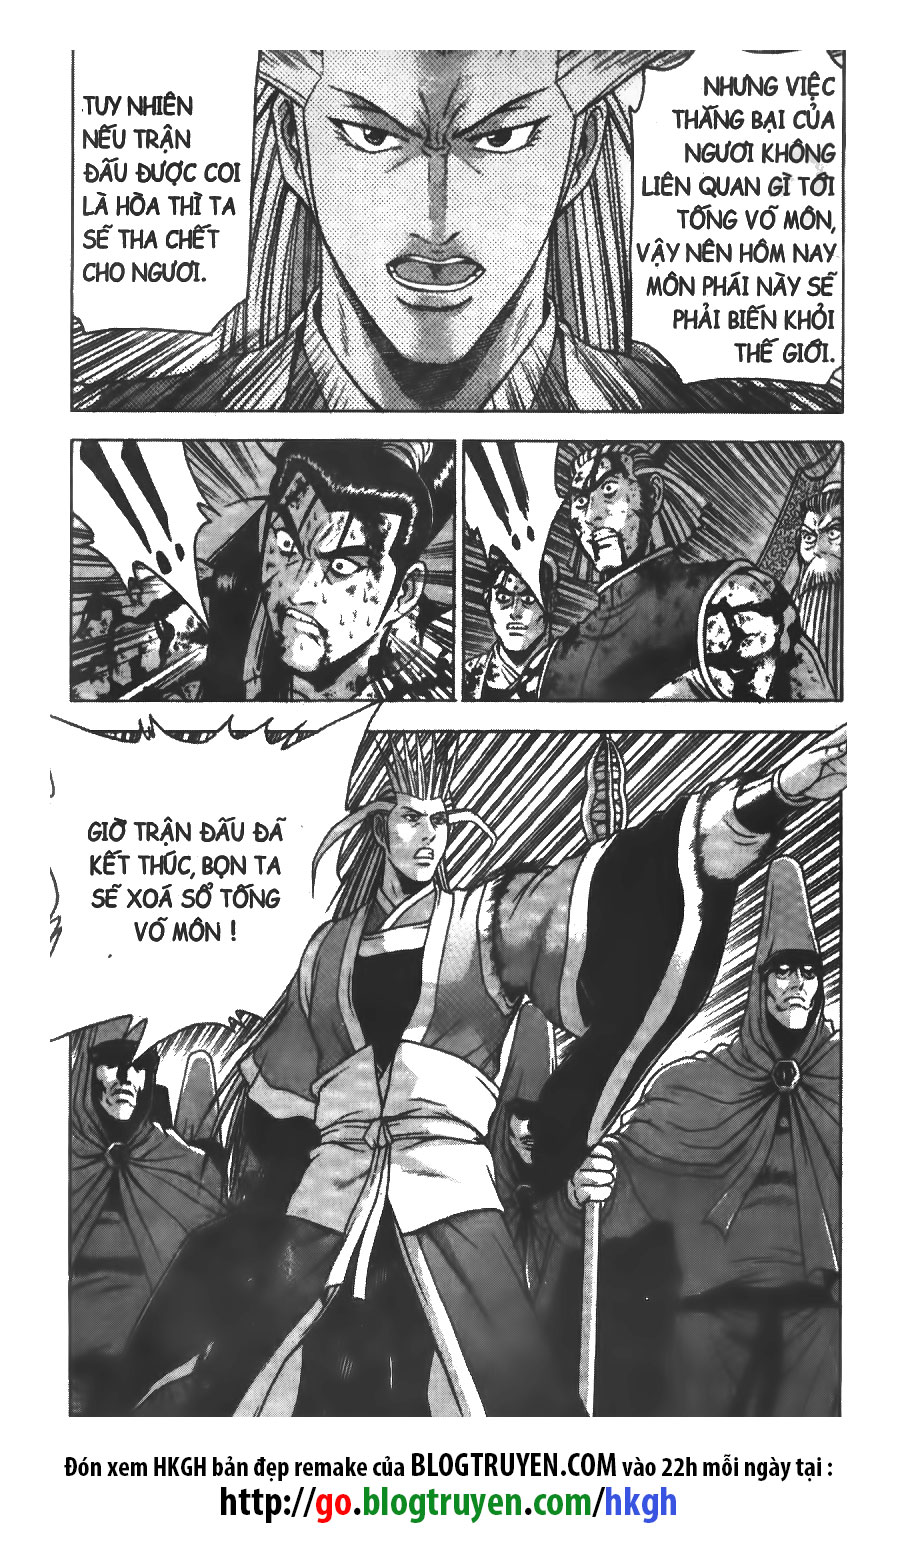 Xem truyen tranh Hi?p Khách Giang H? Chapter 218 cung vuidu.com